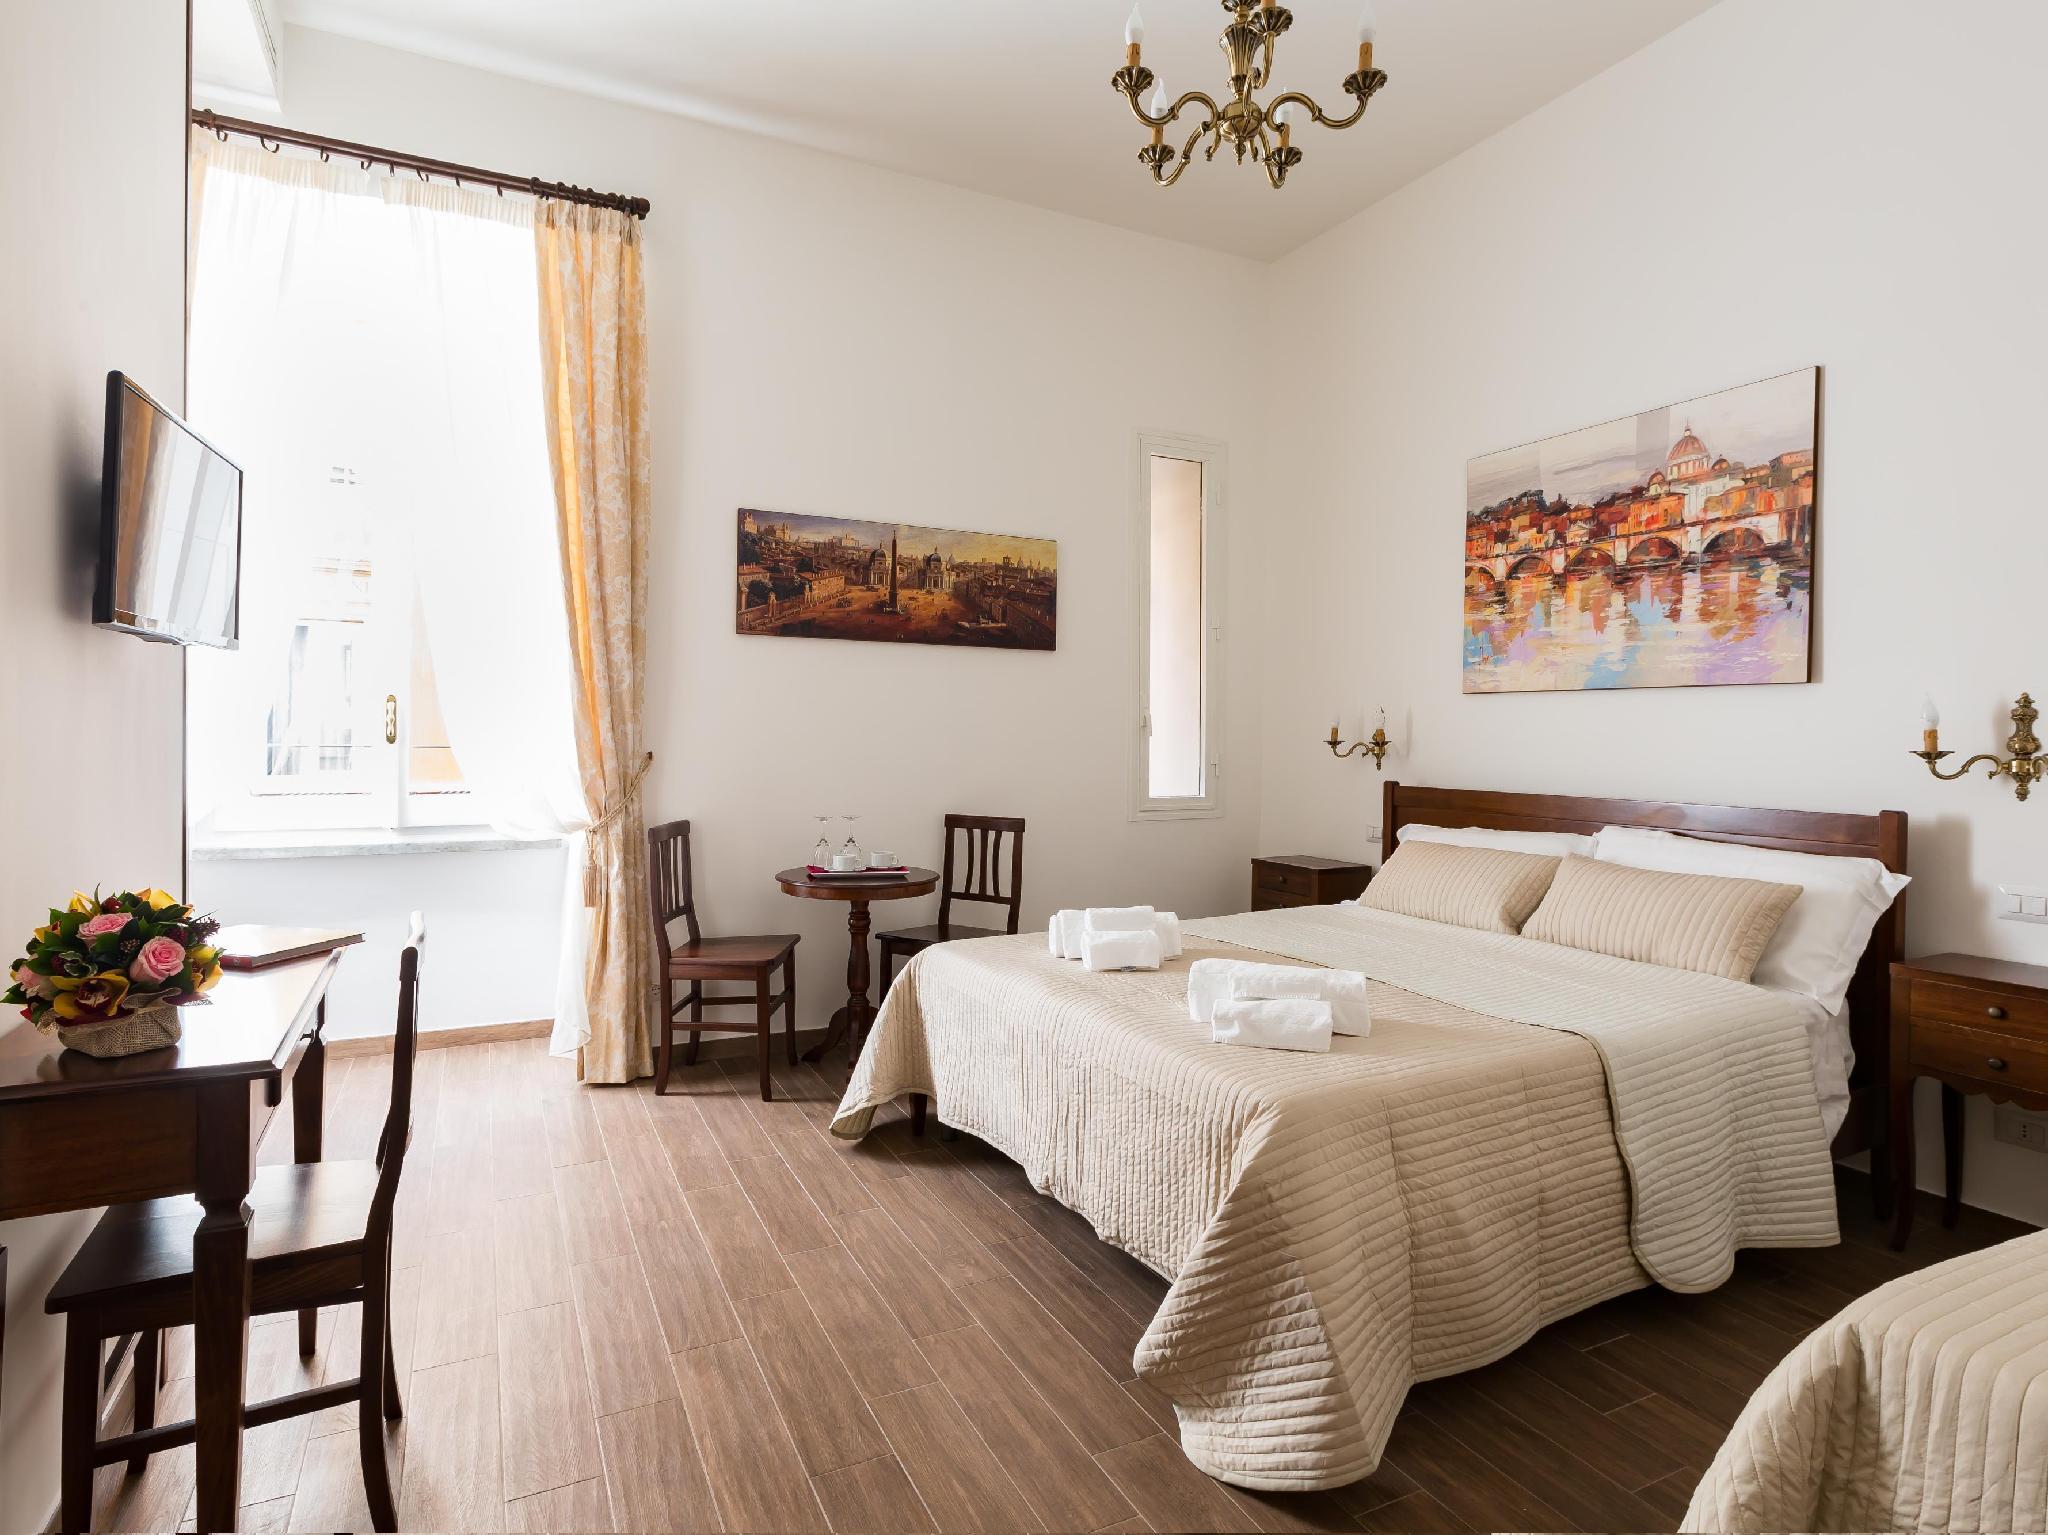 Casa In Monti Guest House